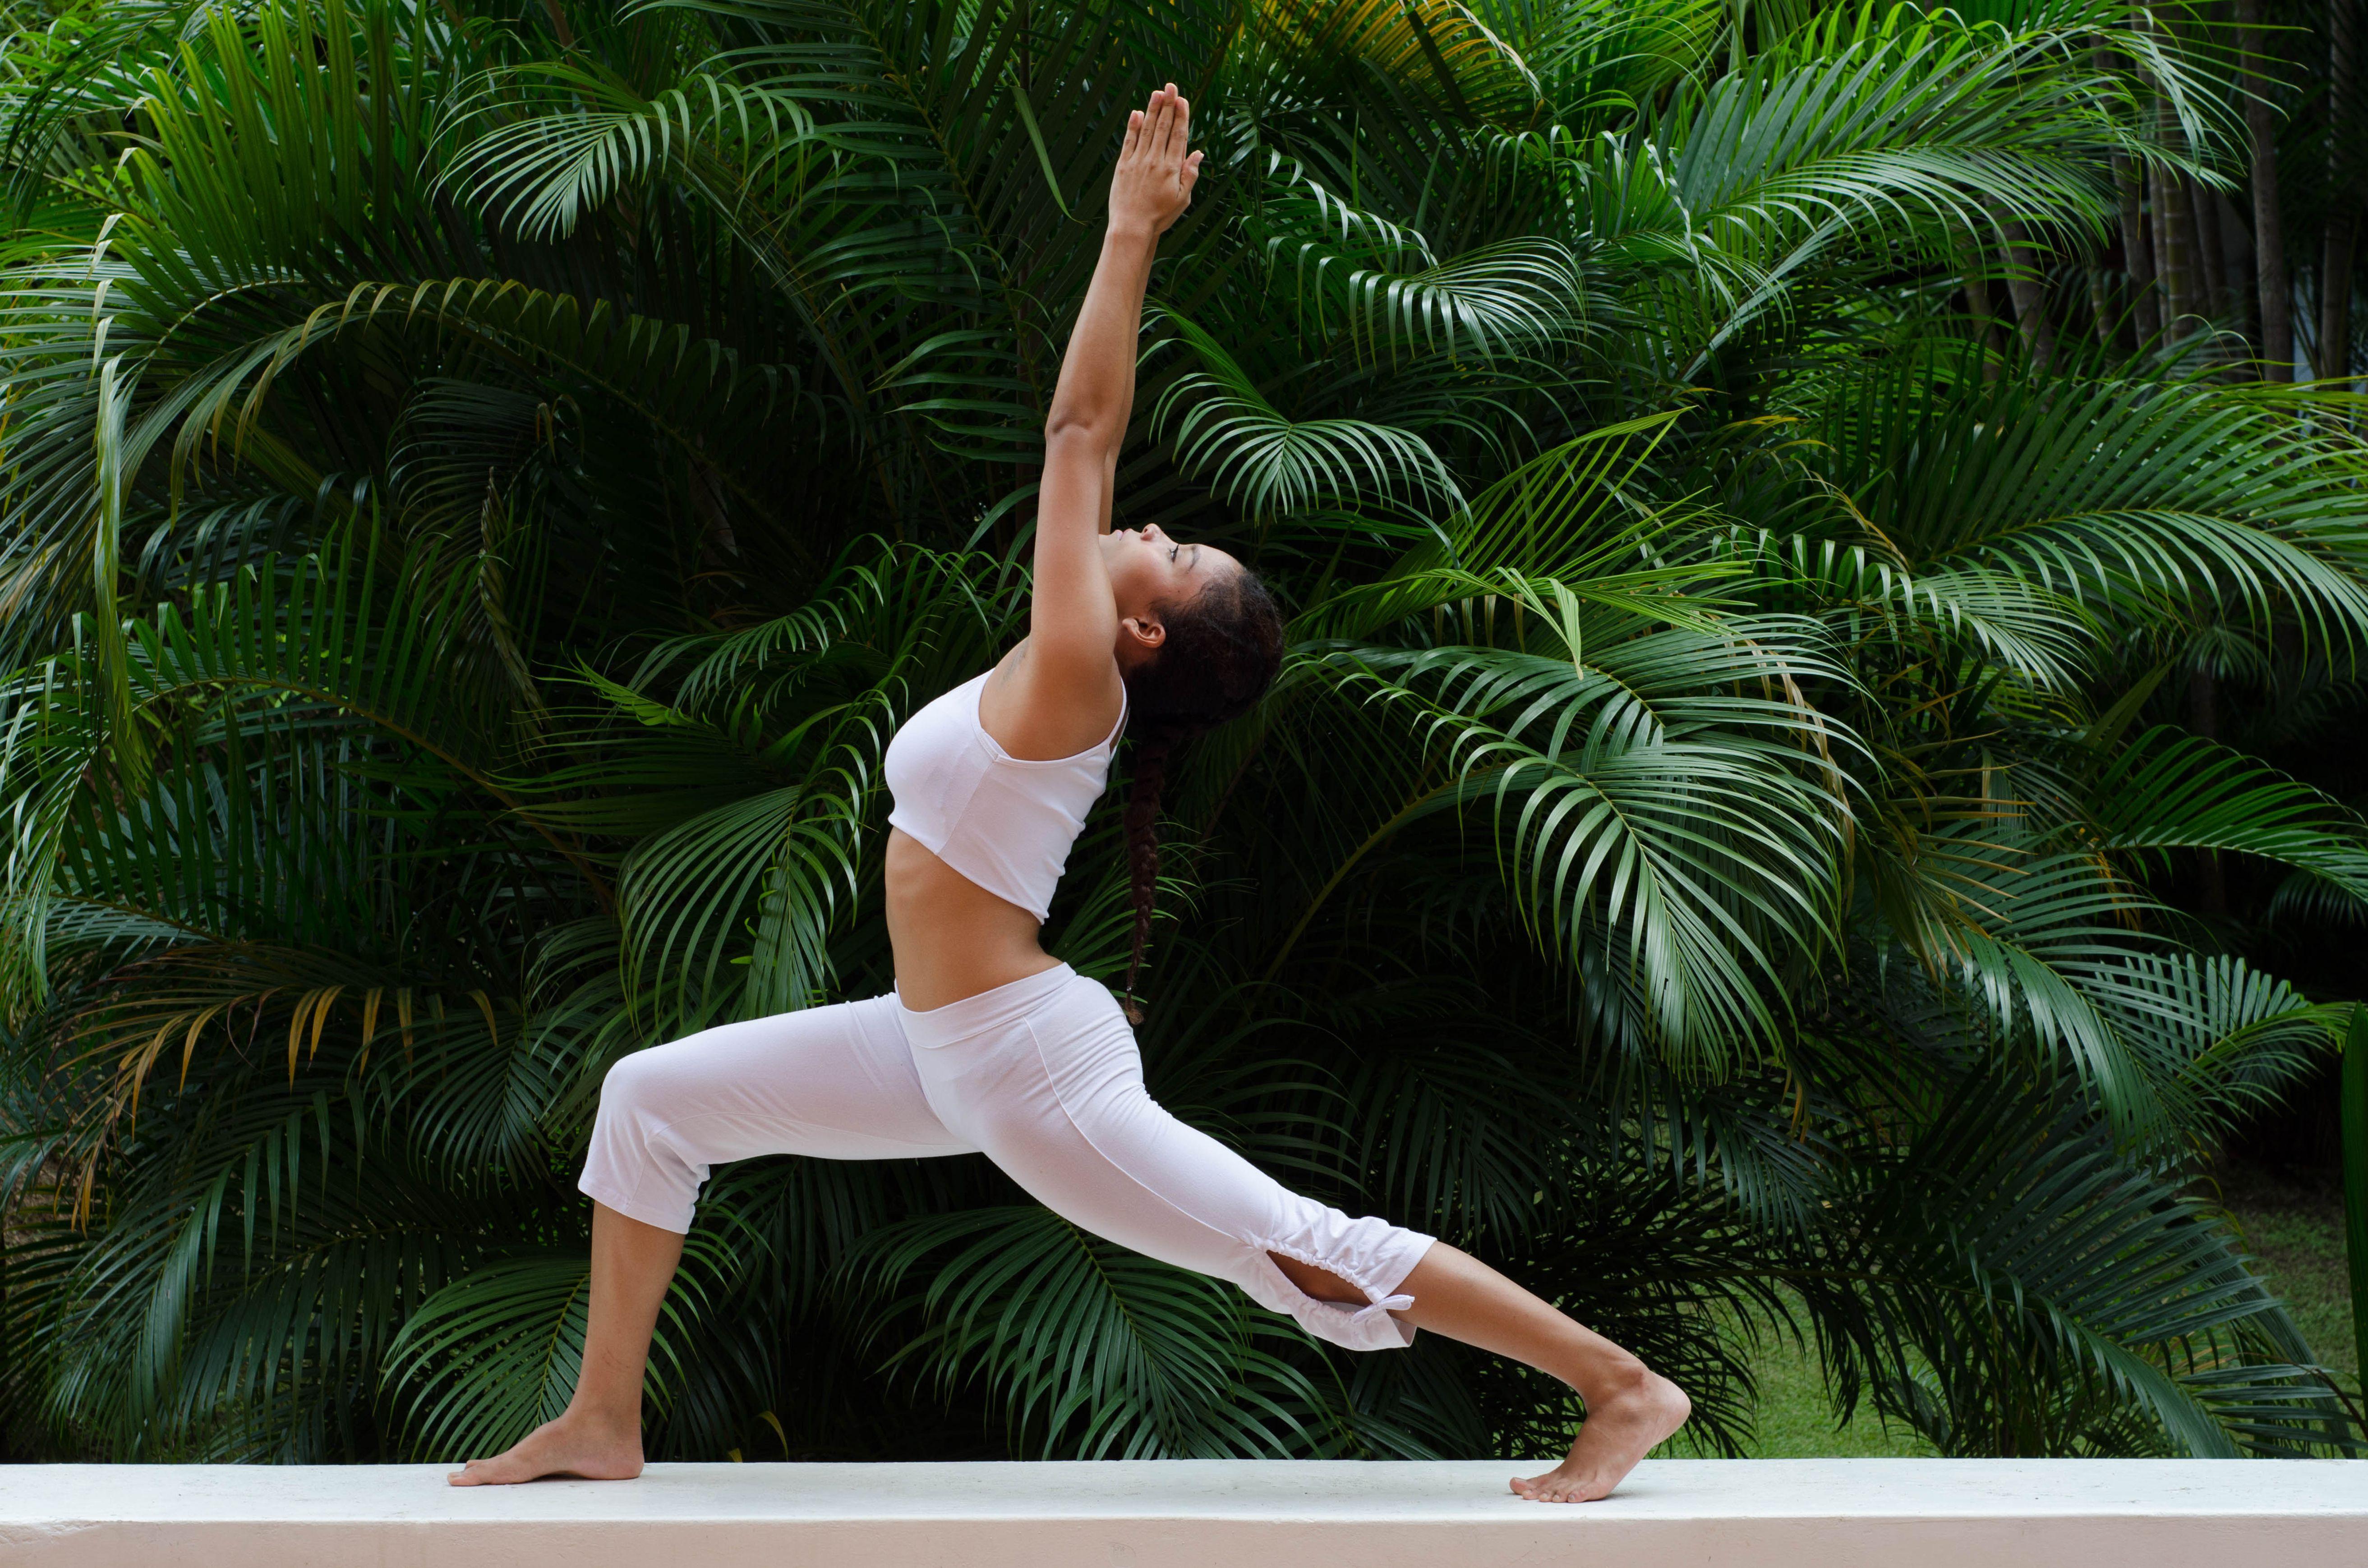 A woman doing a yoga pose on a garden